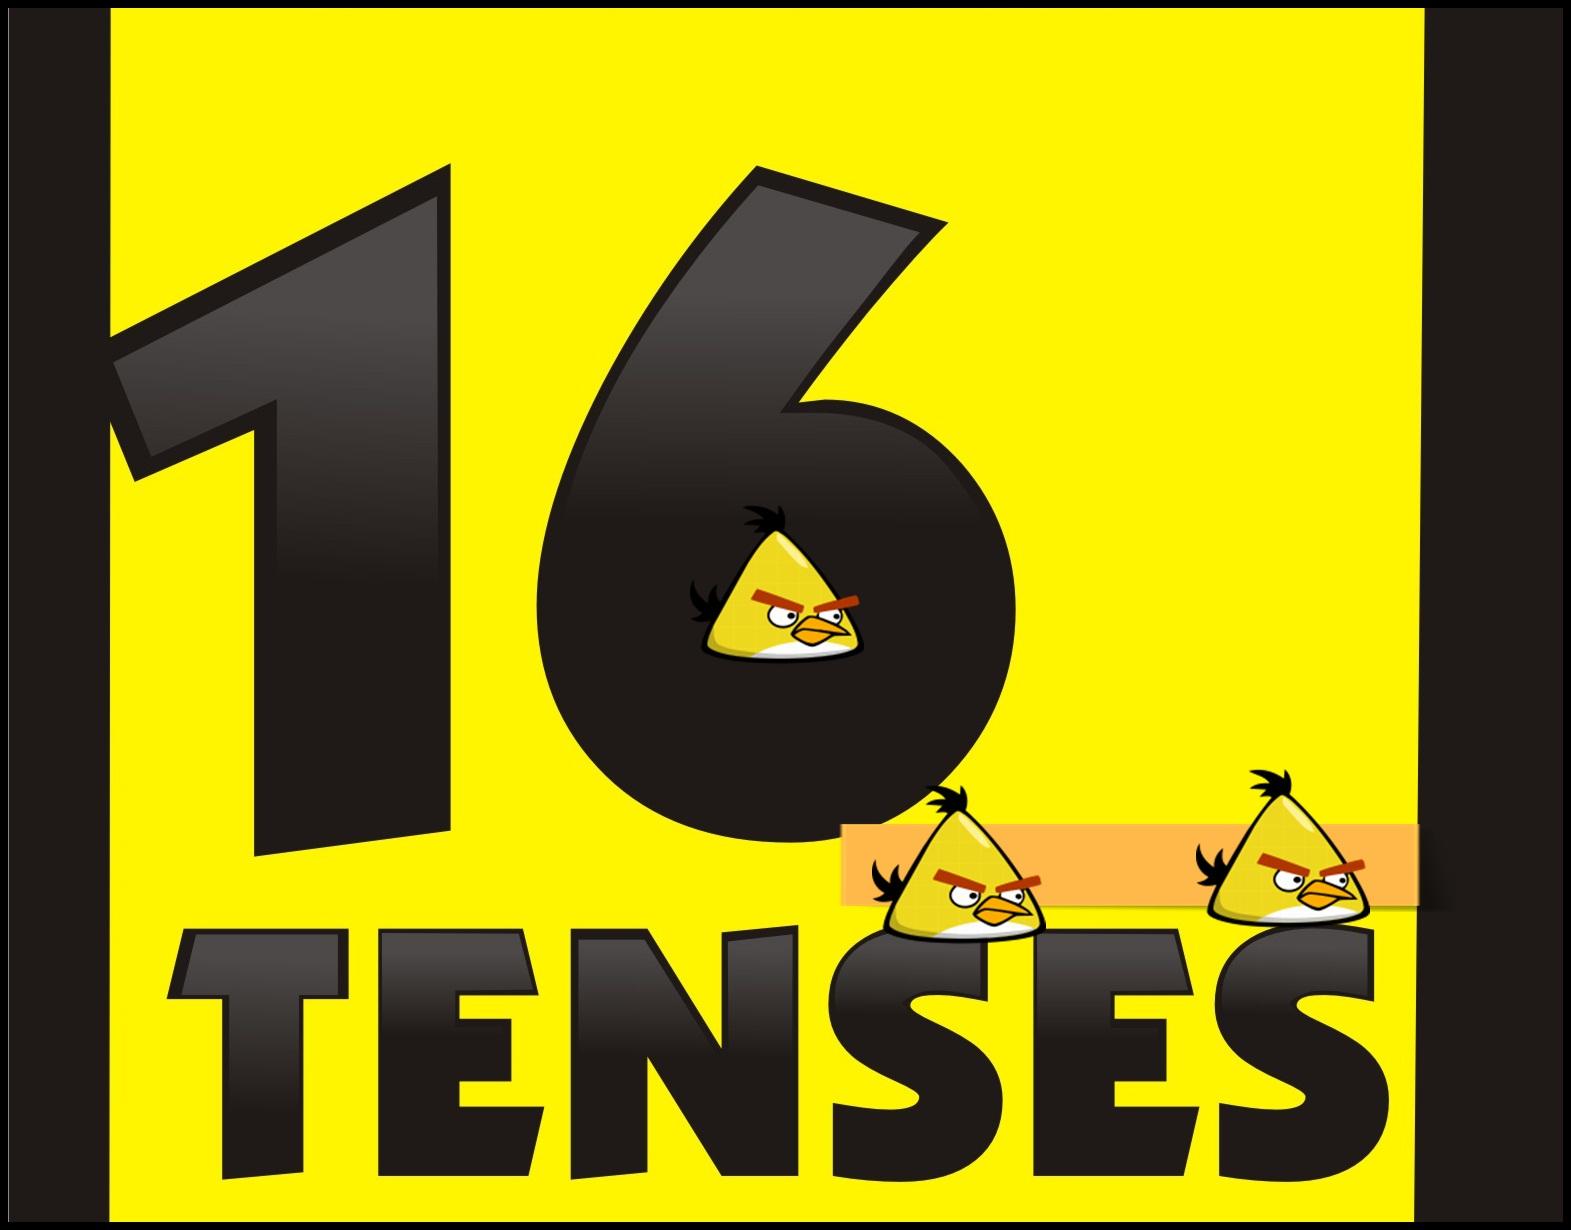 Cerita Kita 16 Tenses Dan Contohnya